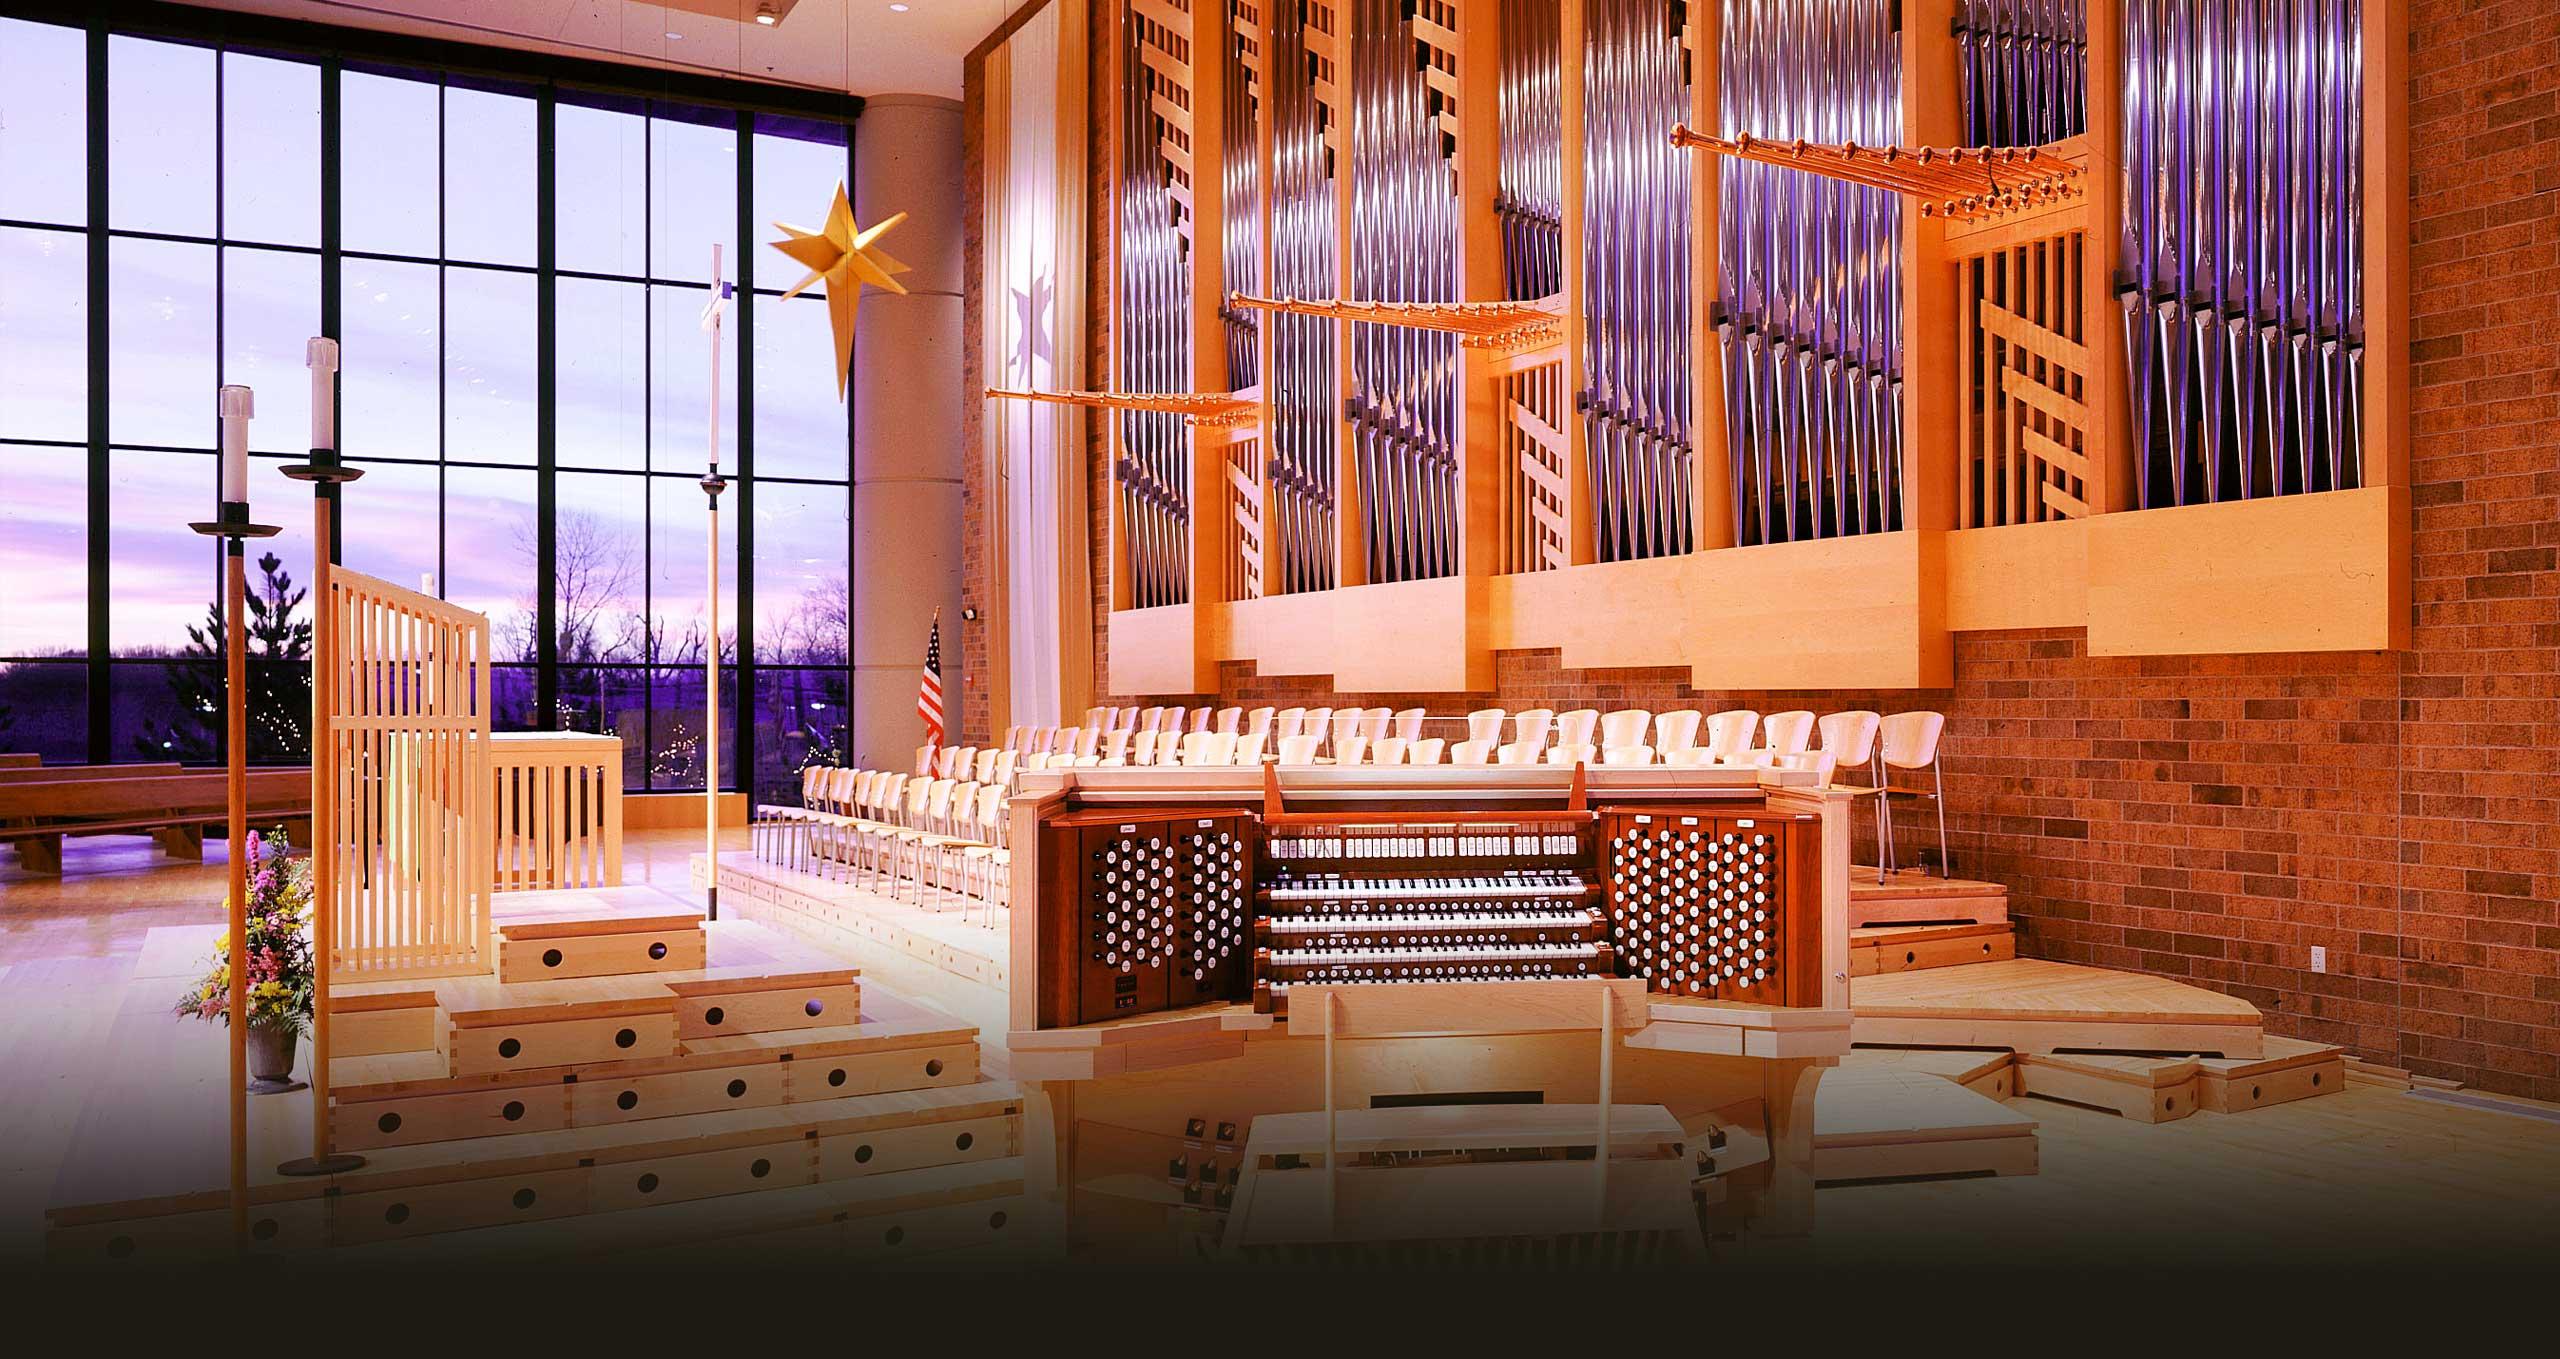 Past Project Archive - The Schantz Organ Company | Recent ...